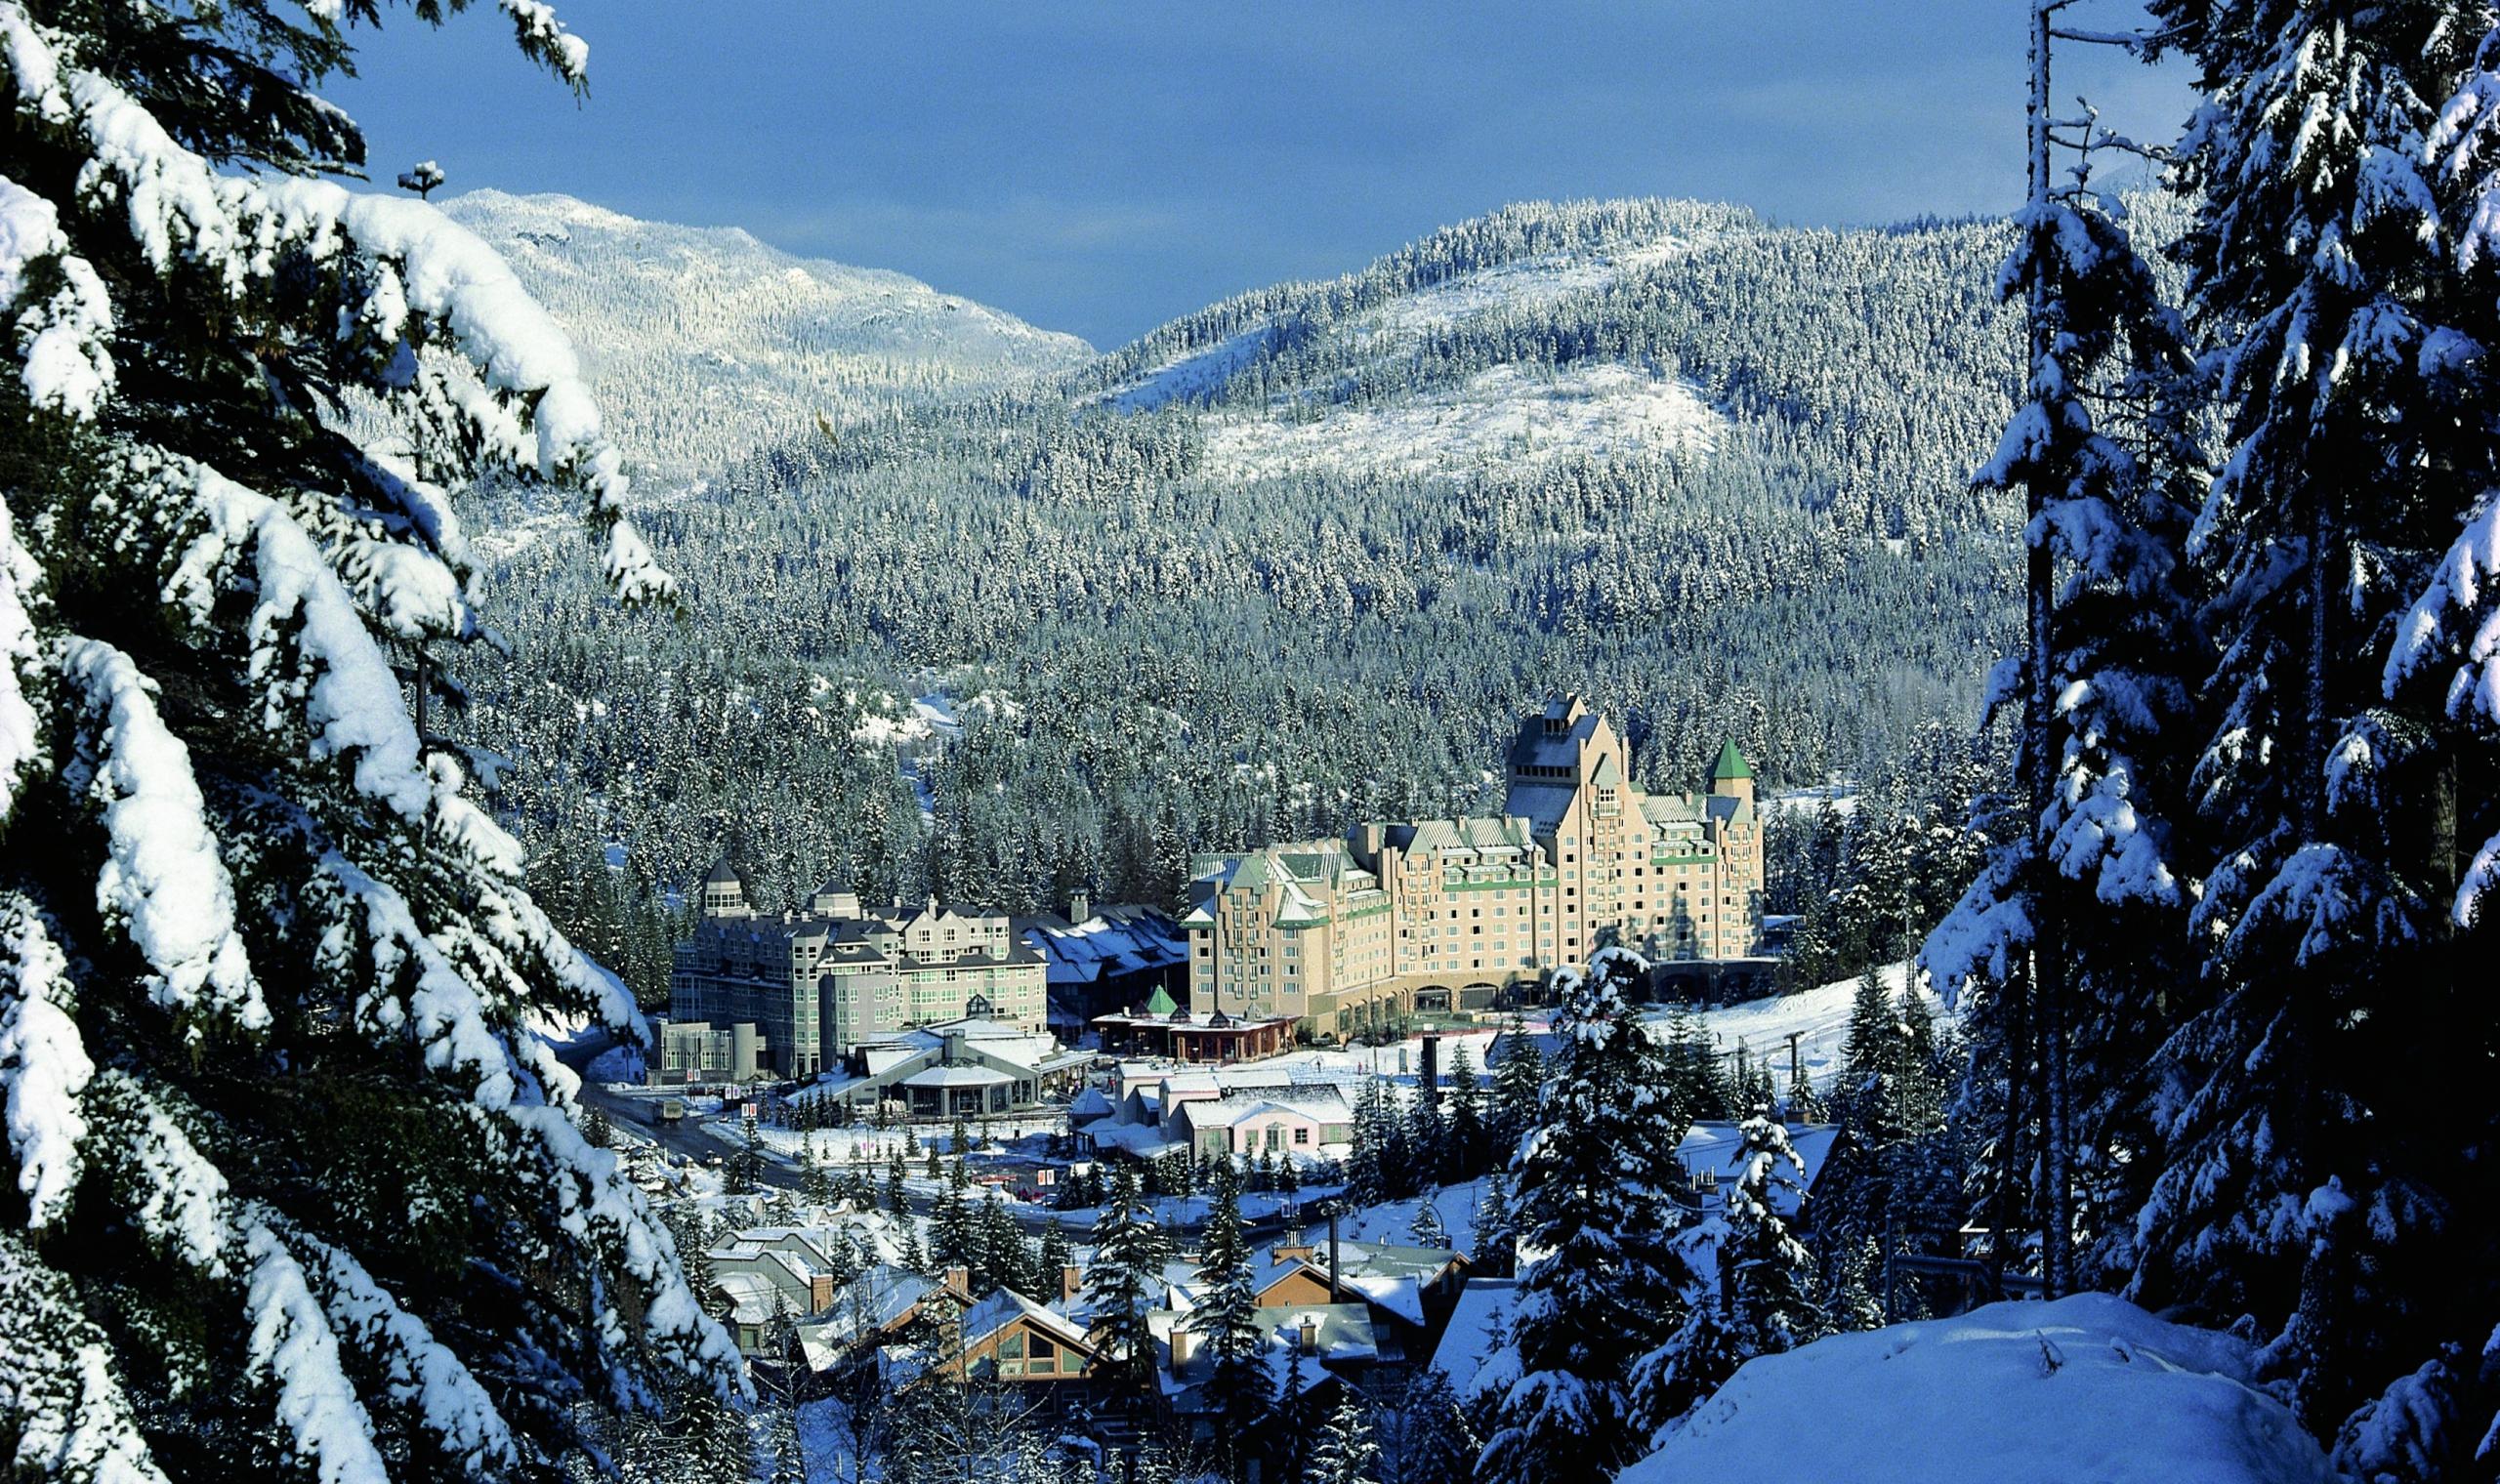 Fairmont Chateau Whistler Whistler Canadian Affair